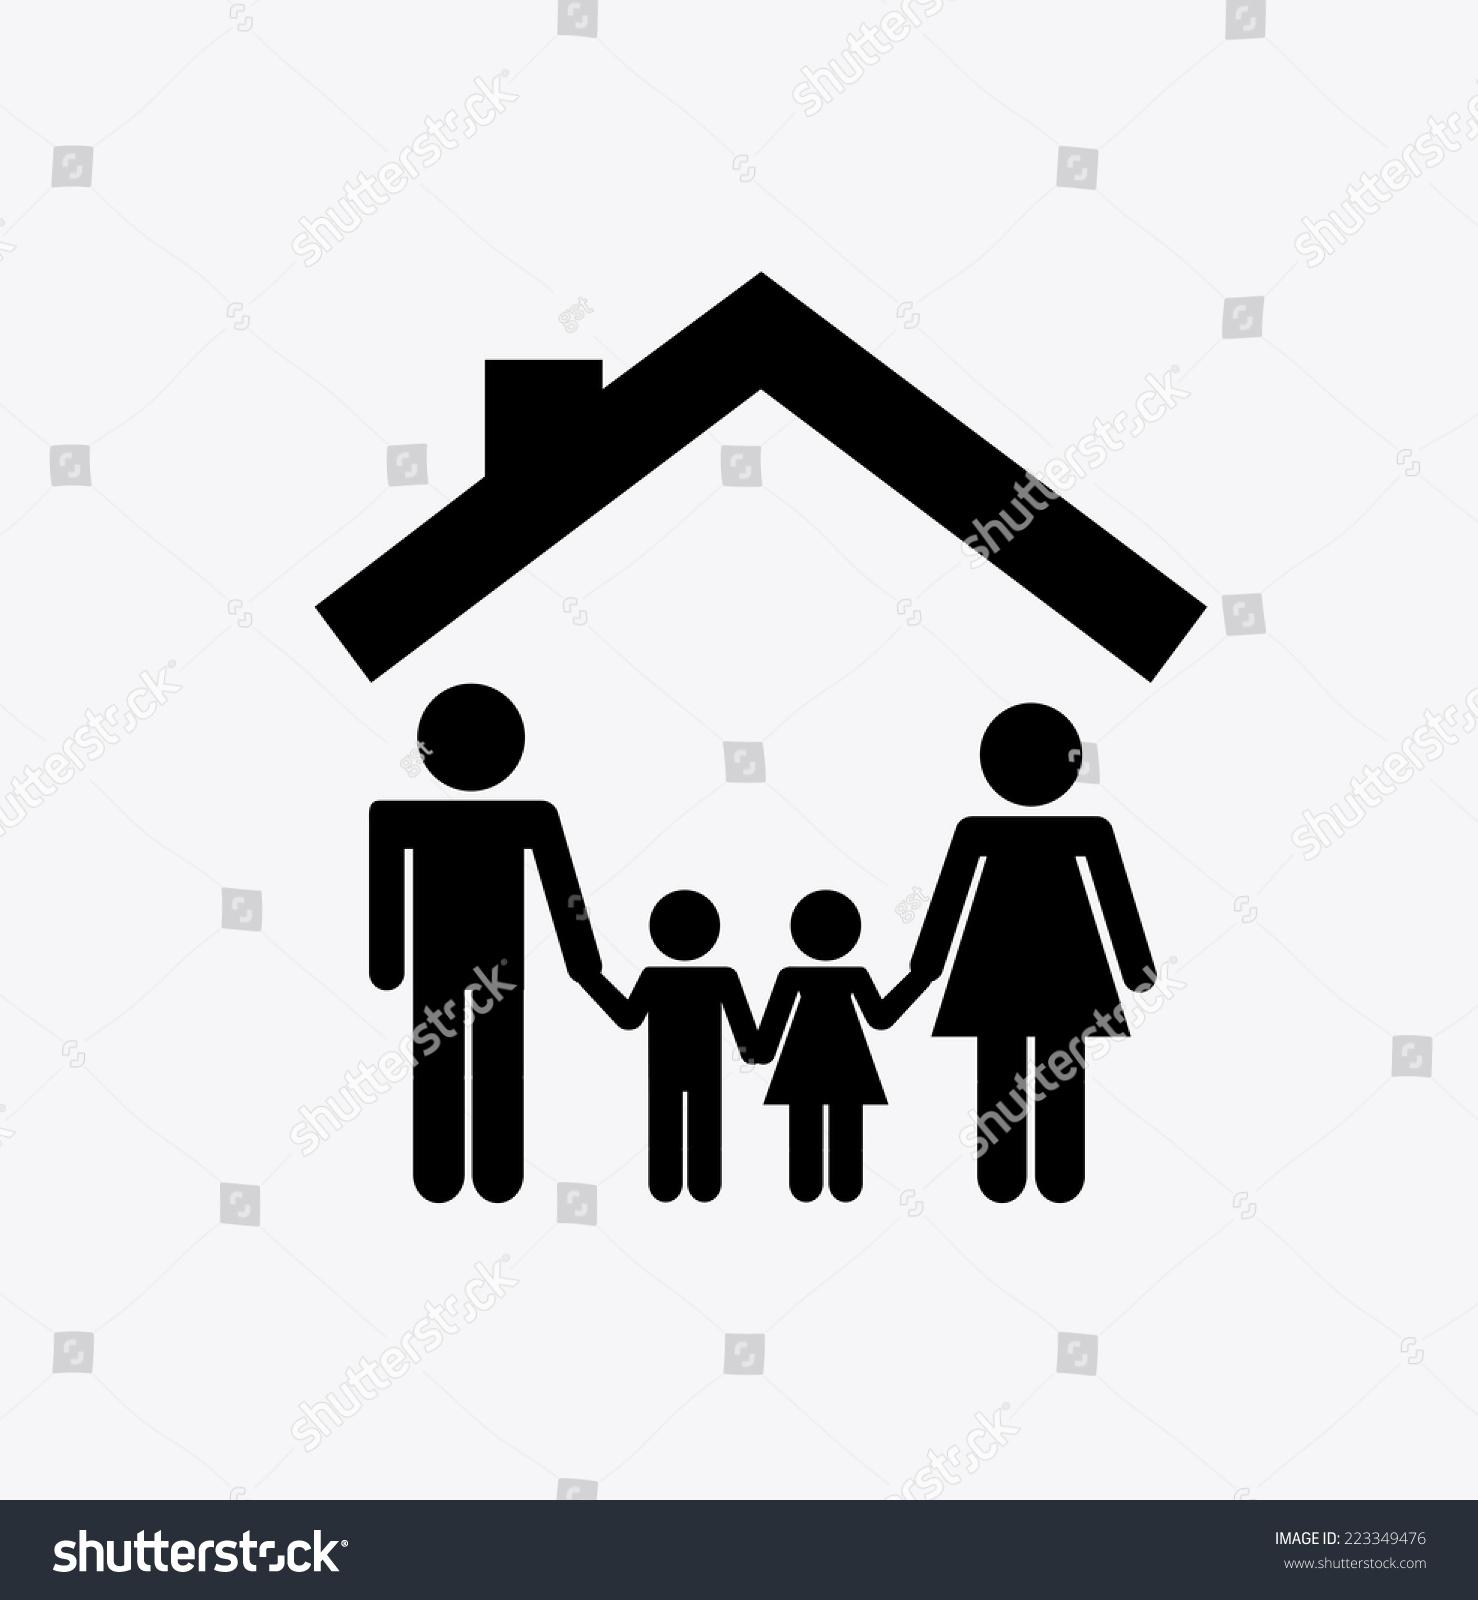 Family graphic design vector illustration stock vector for Family picture design